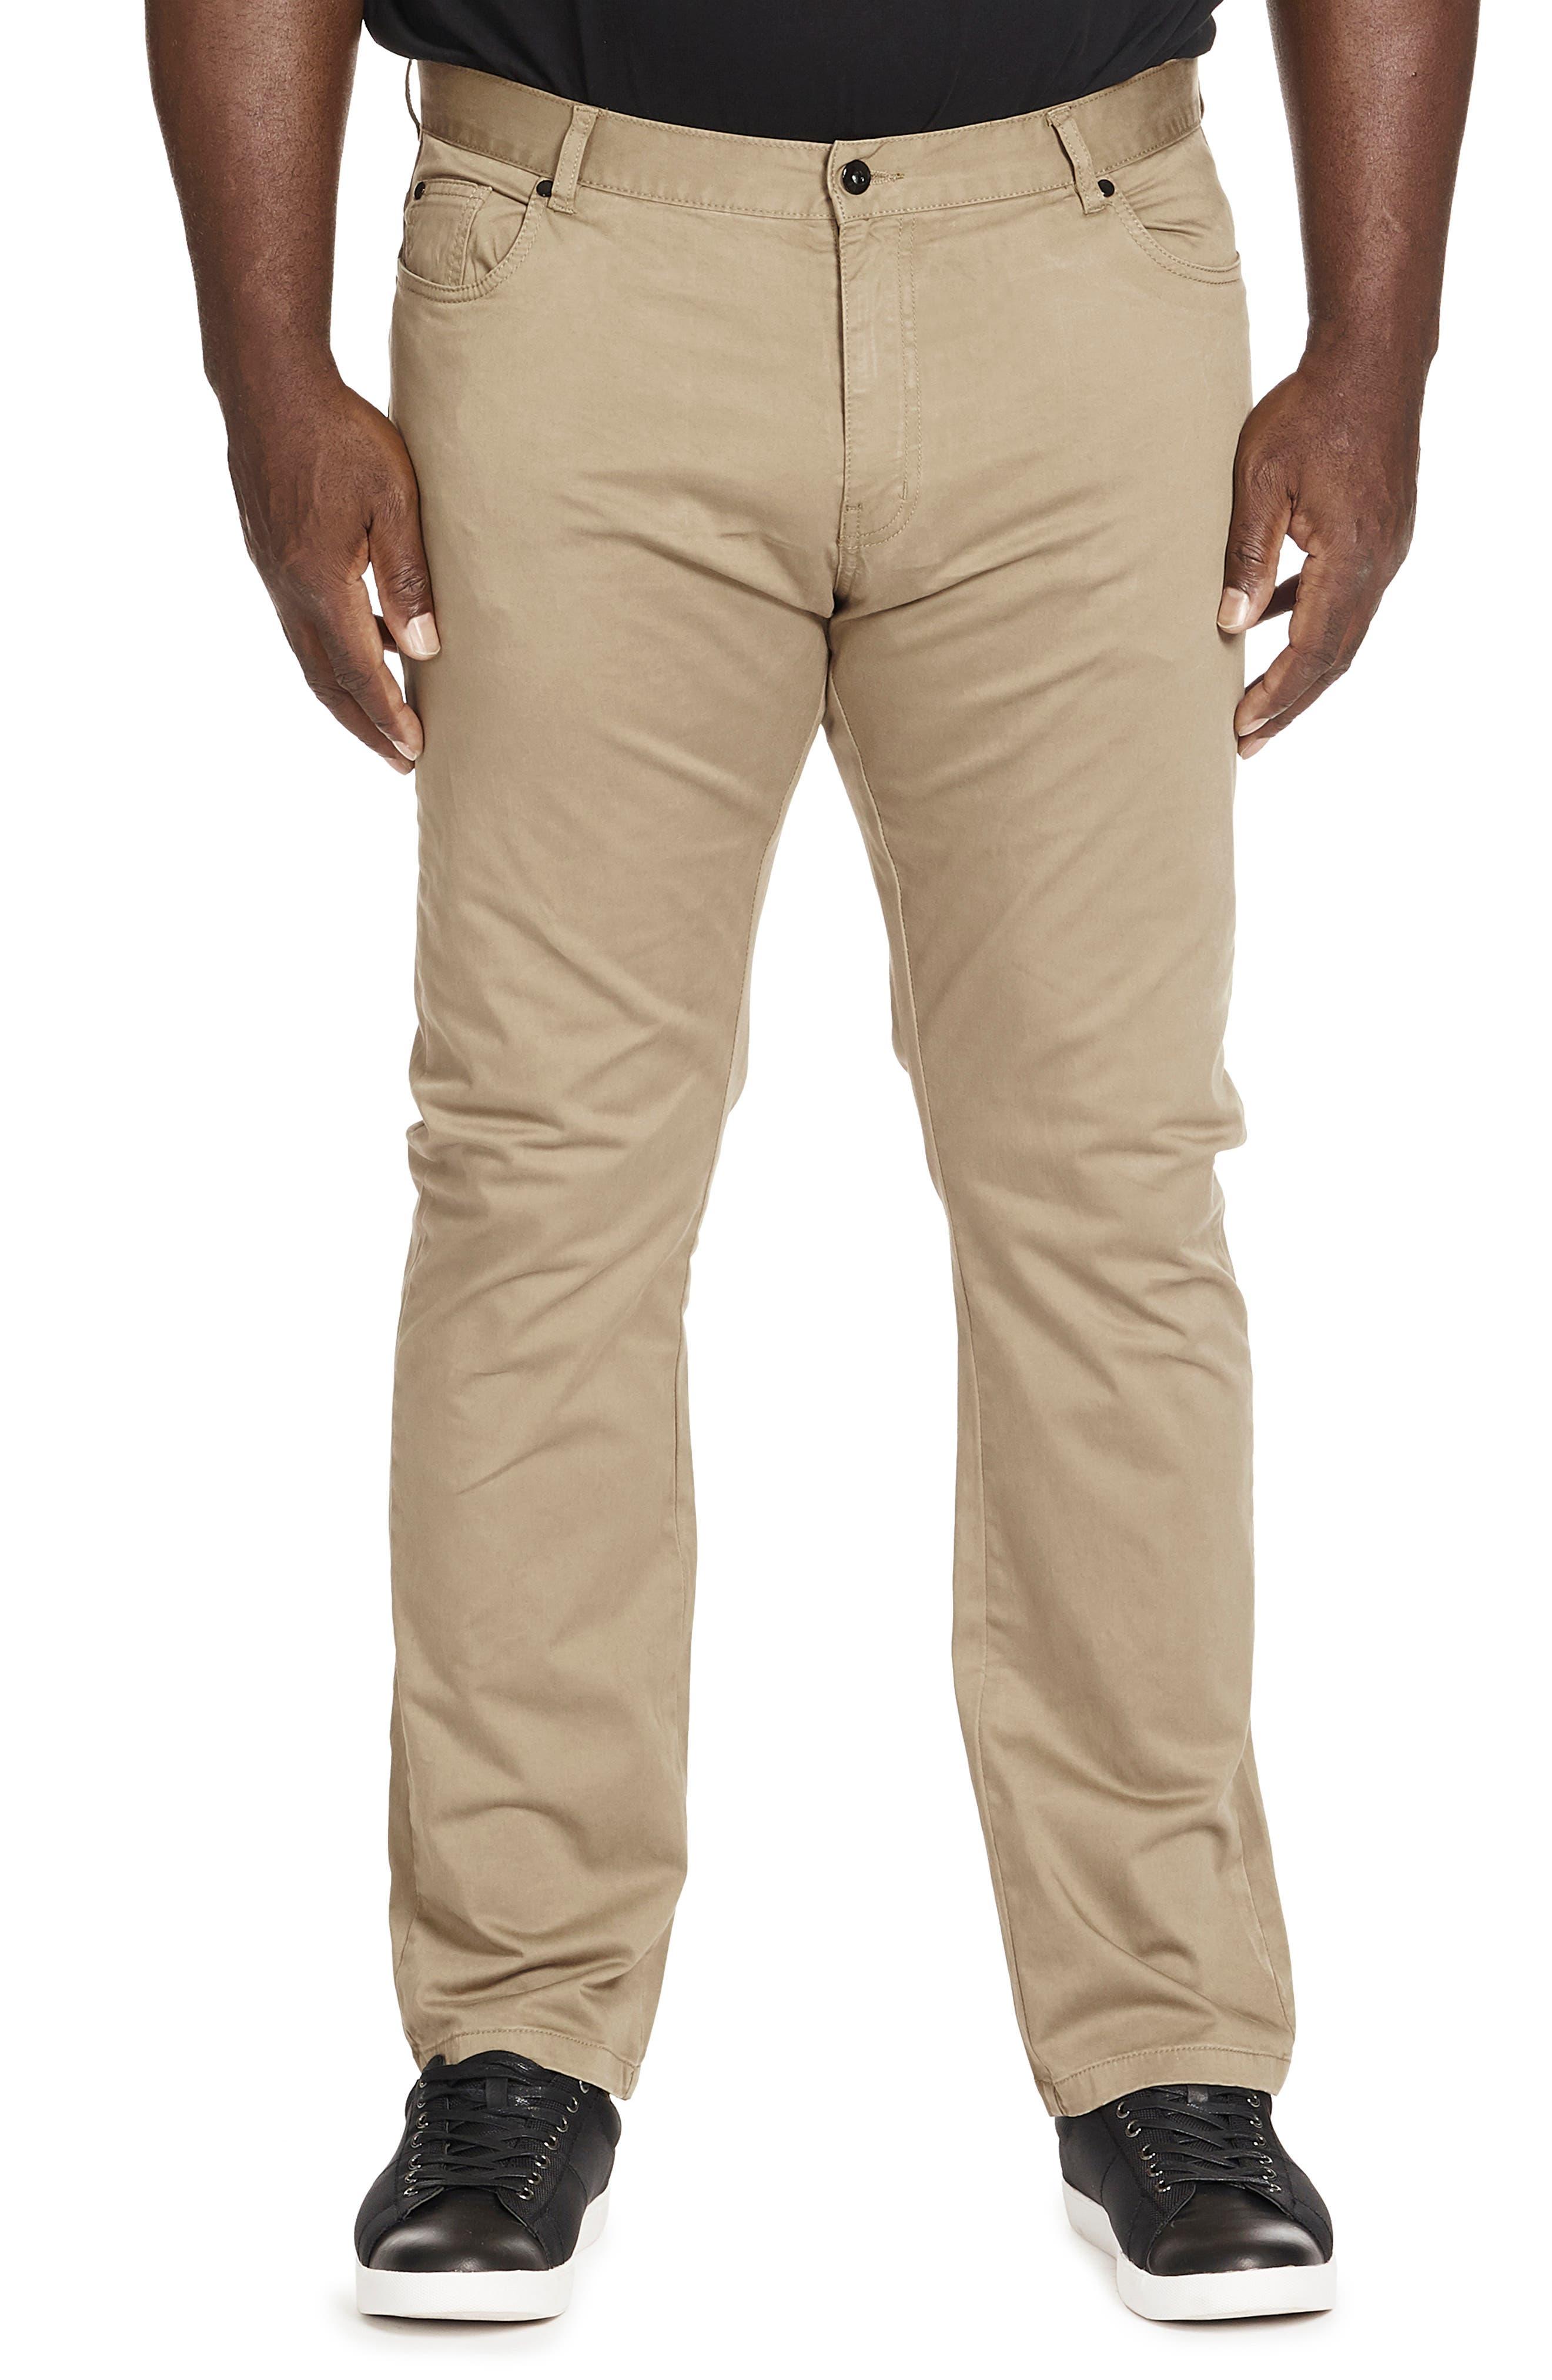 Benny Five-Pocket Pants